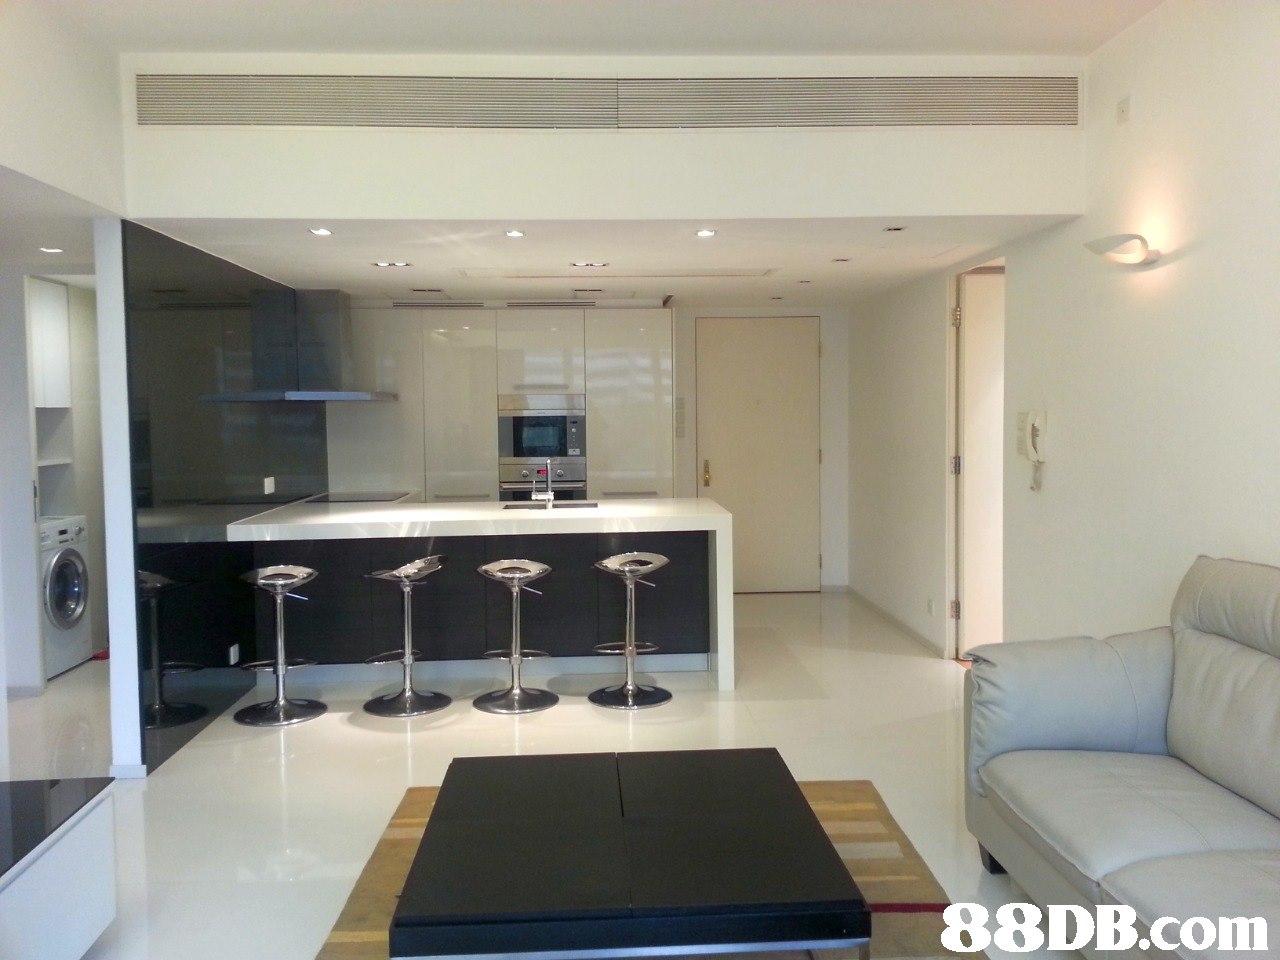 property,room,interior design,real estate,loft